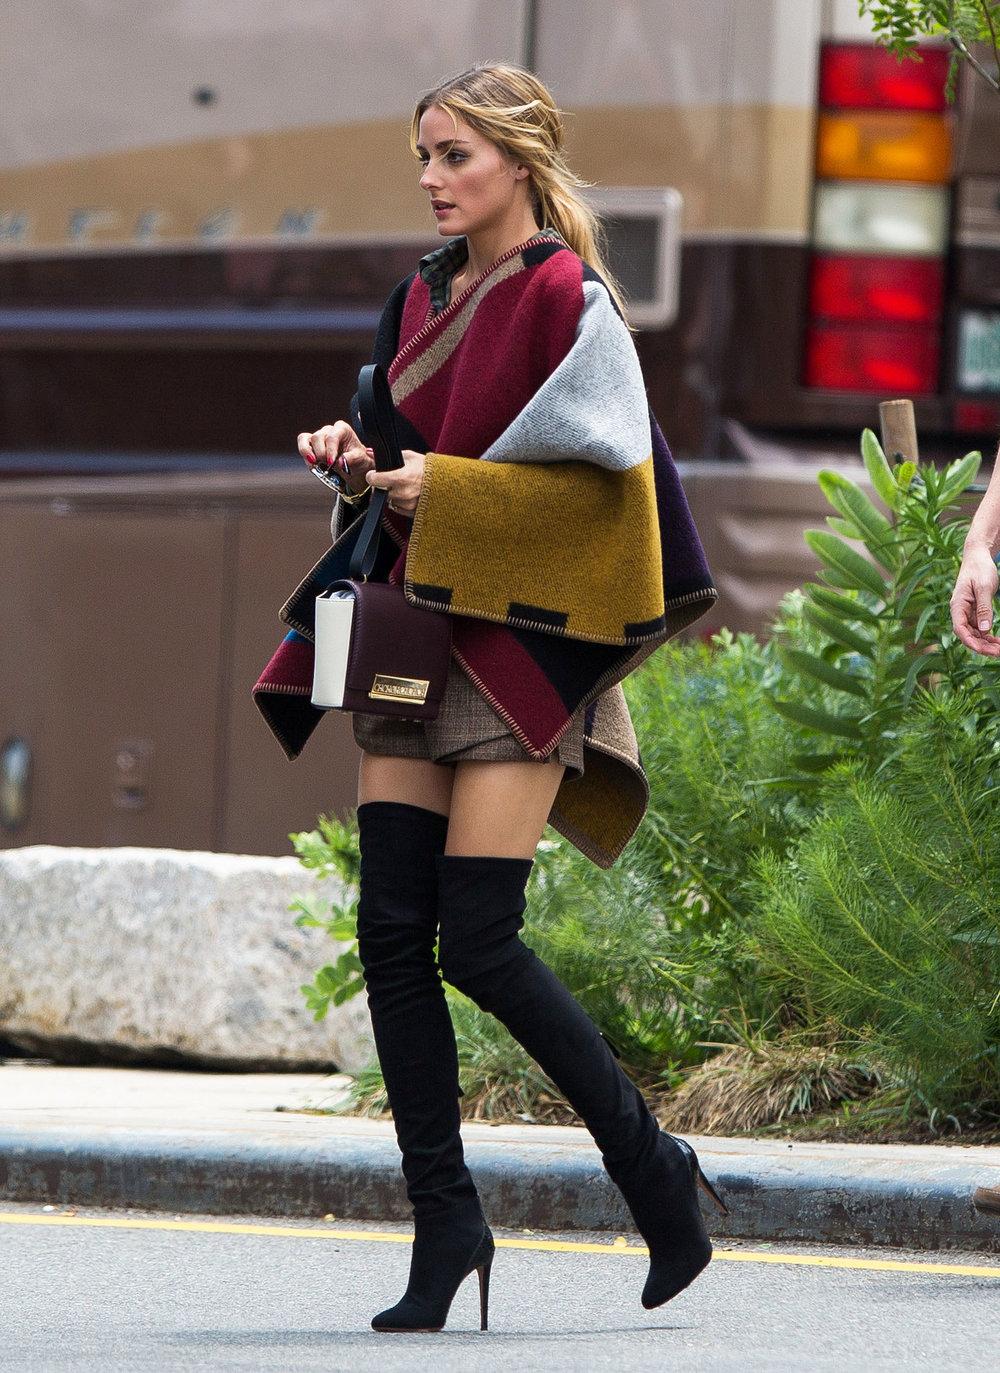 fashionWorks-Knee-High-Boots-Olivia-Palermo.jpg